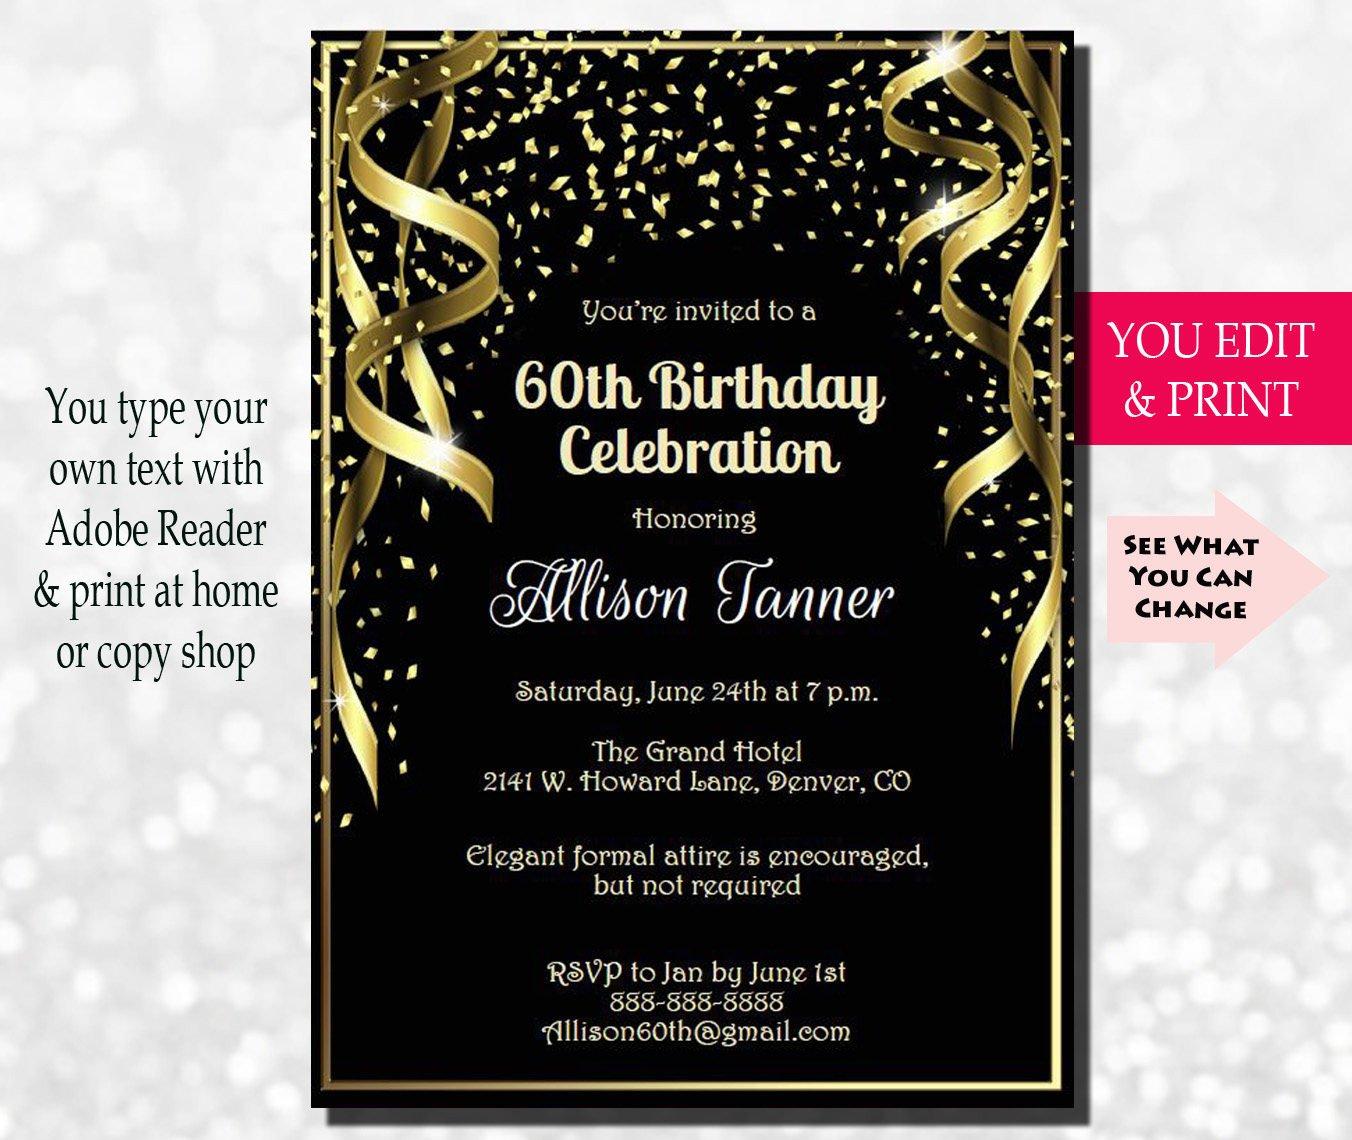 60 Th Birthday Invitation 60th Birthday Invitation 60th Birthday Party Invitation 60th